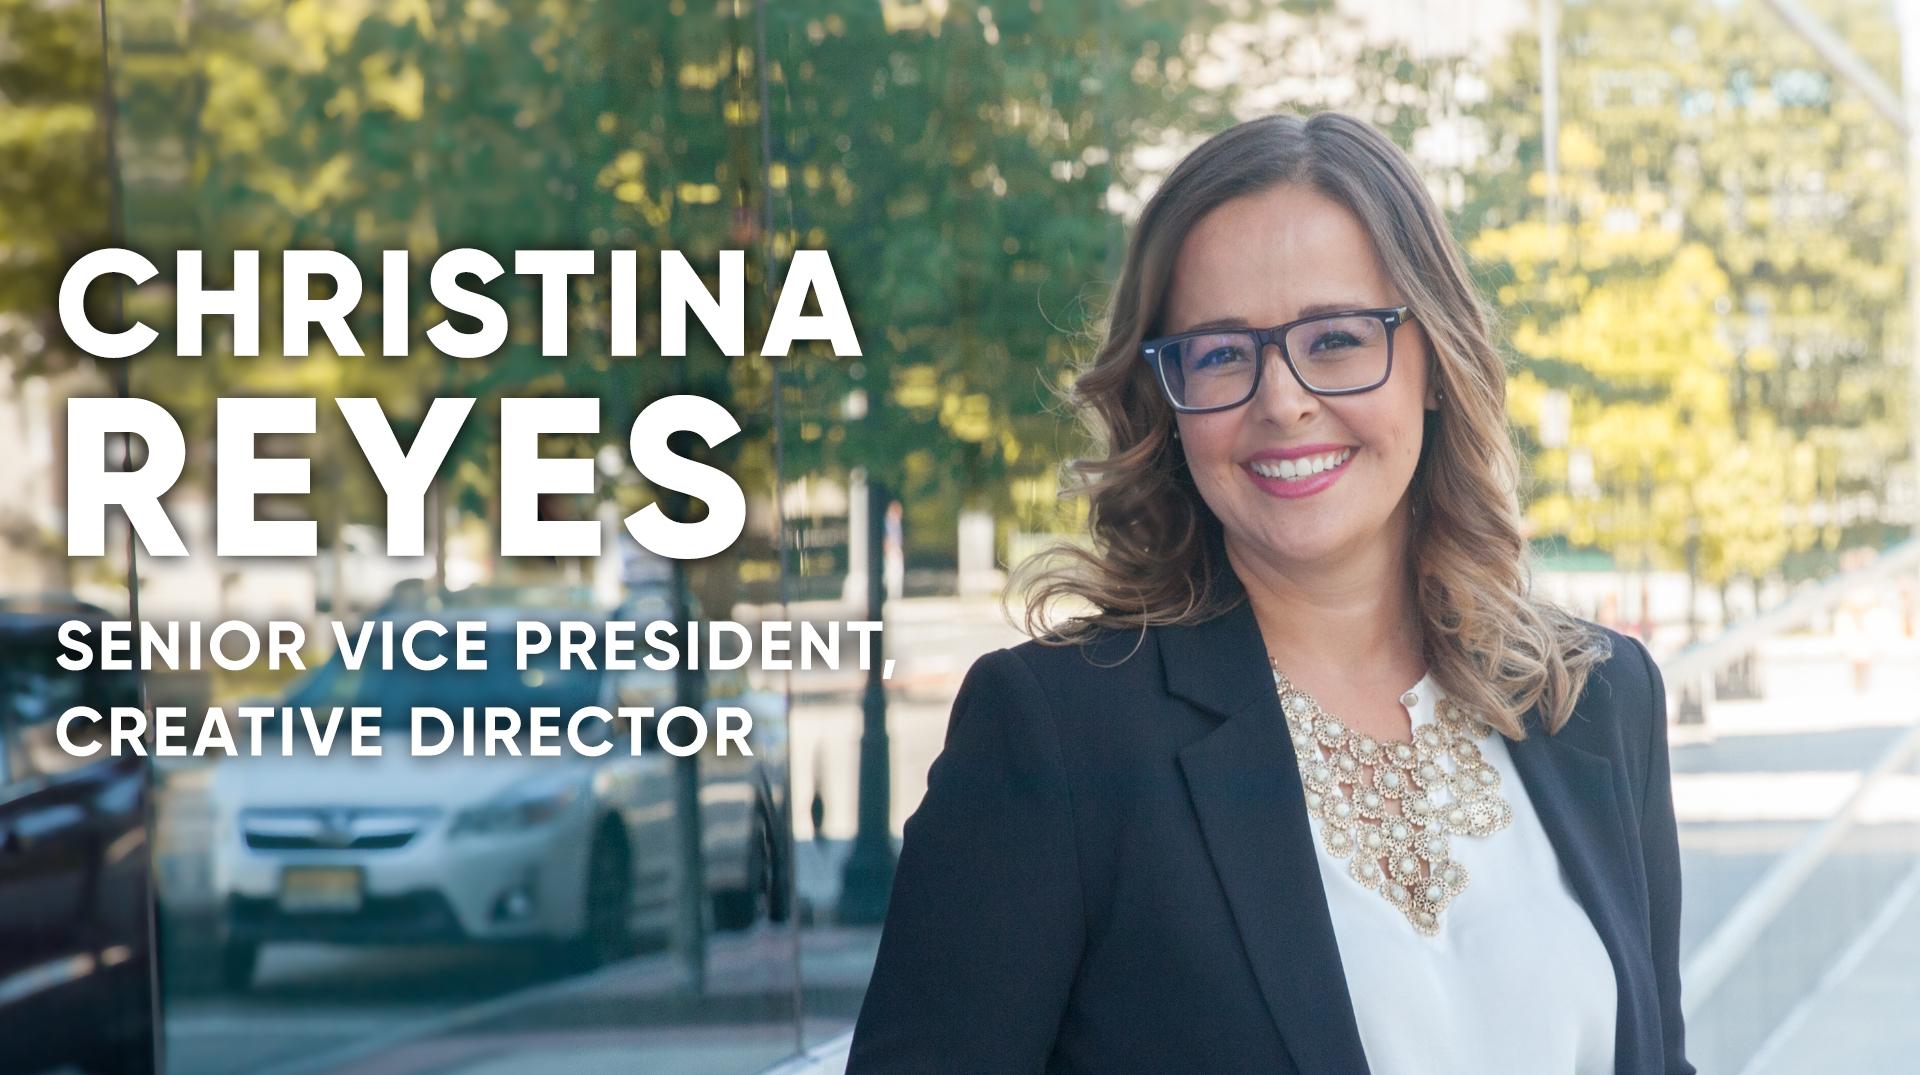 Christina Reyes, senior vice president and creative director at Copy & Art